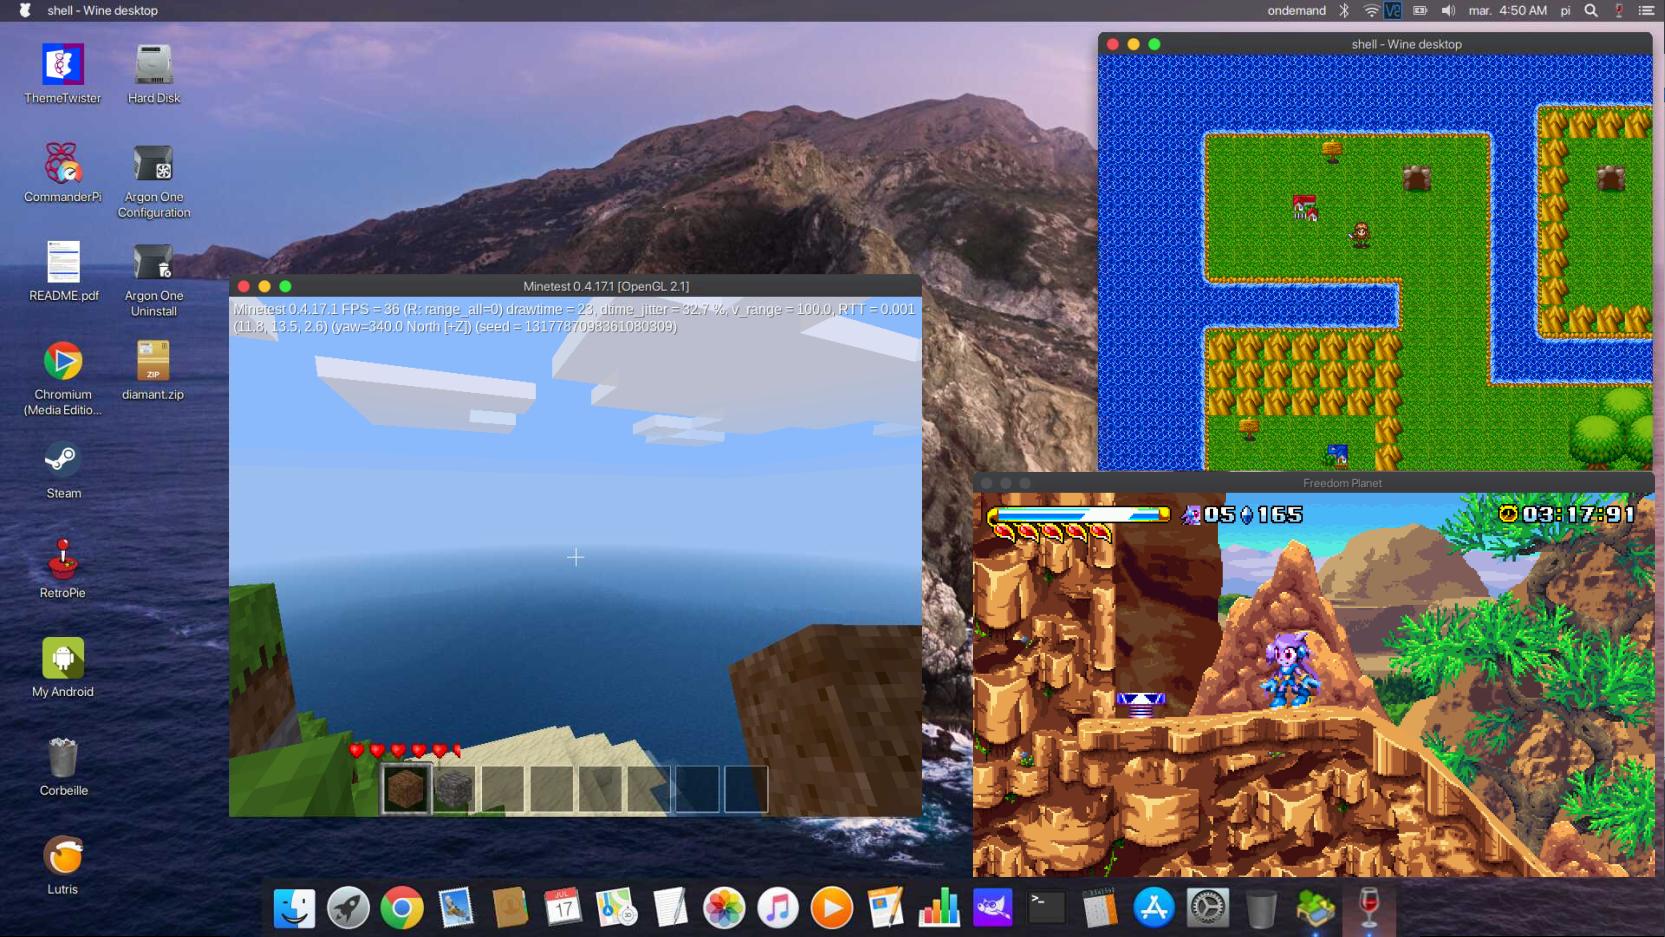 TwisterOS - Minecraft Pi Edition & Wine